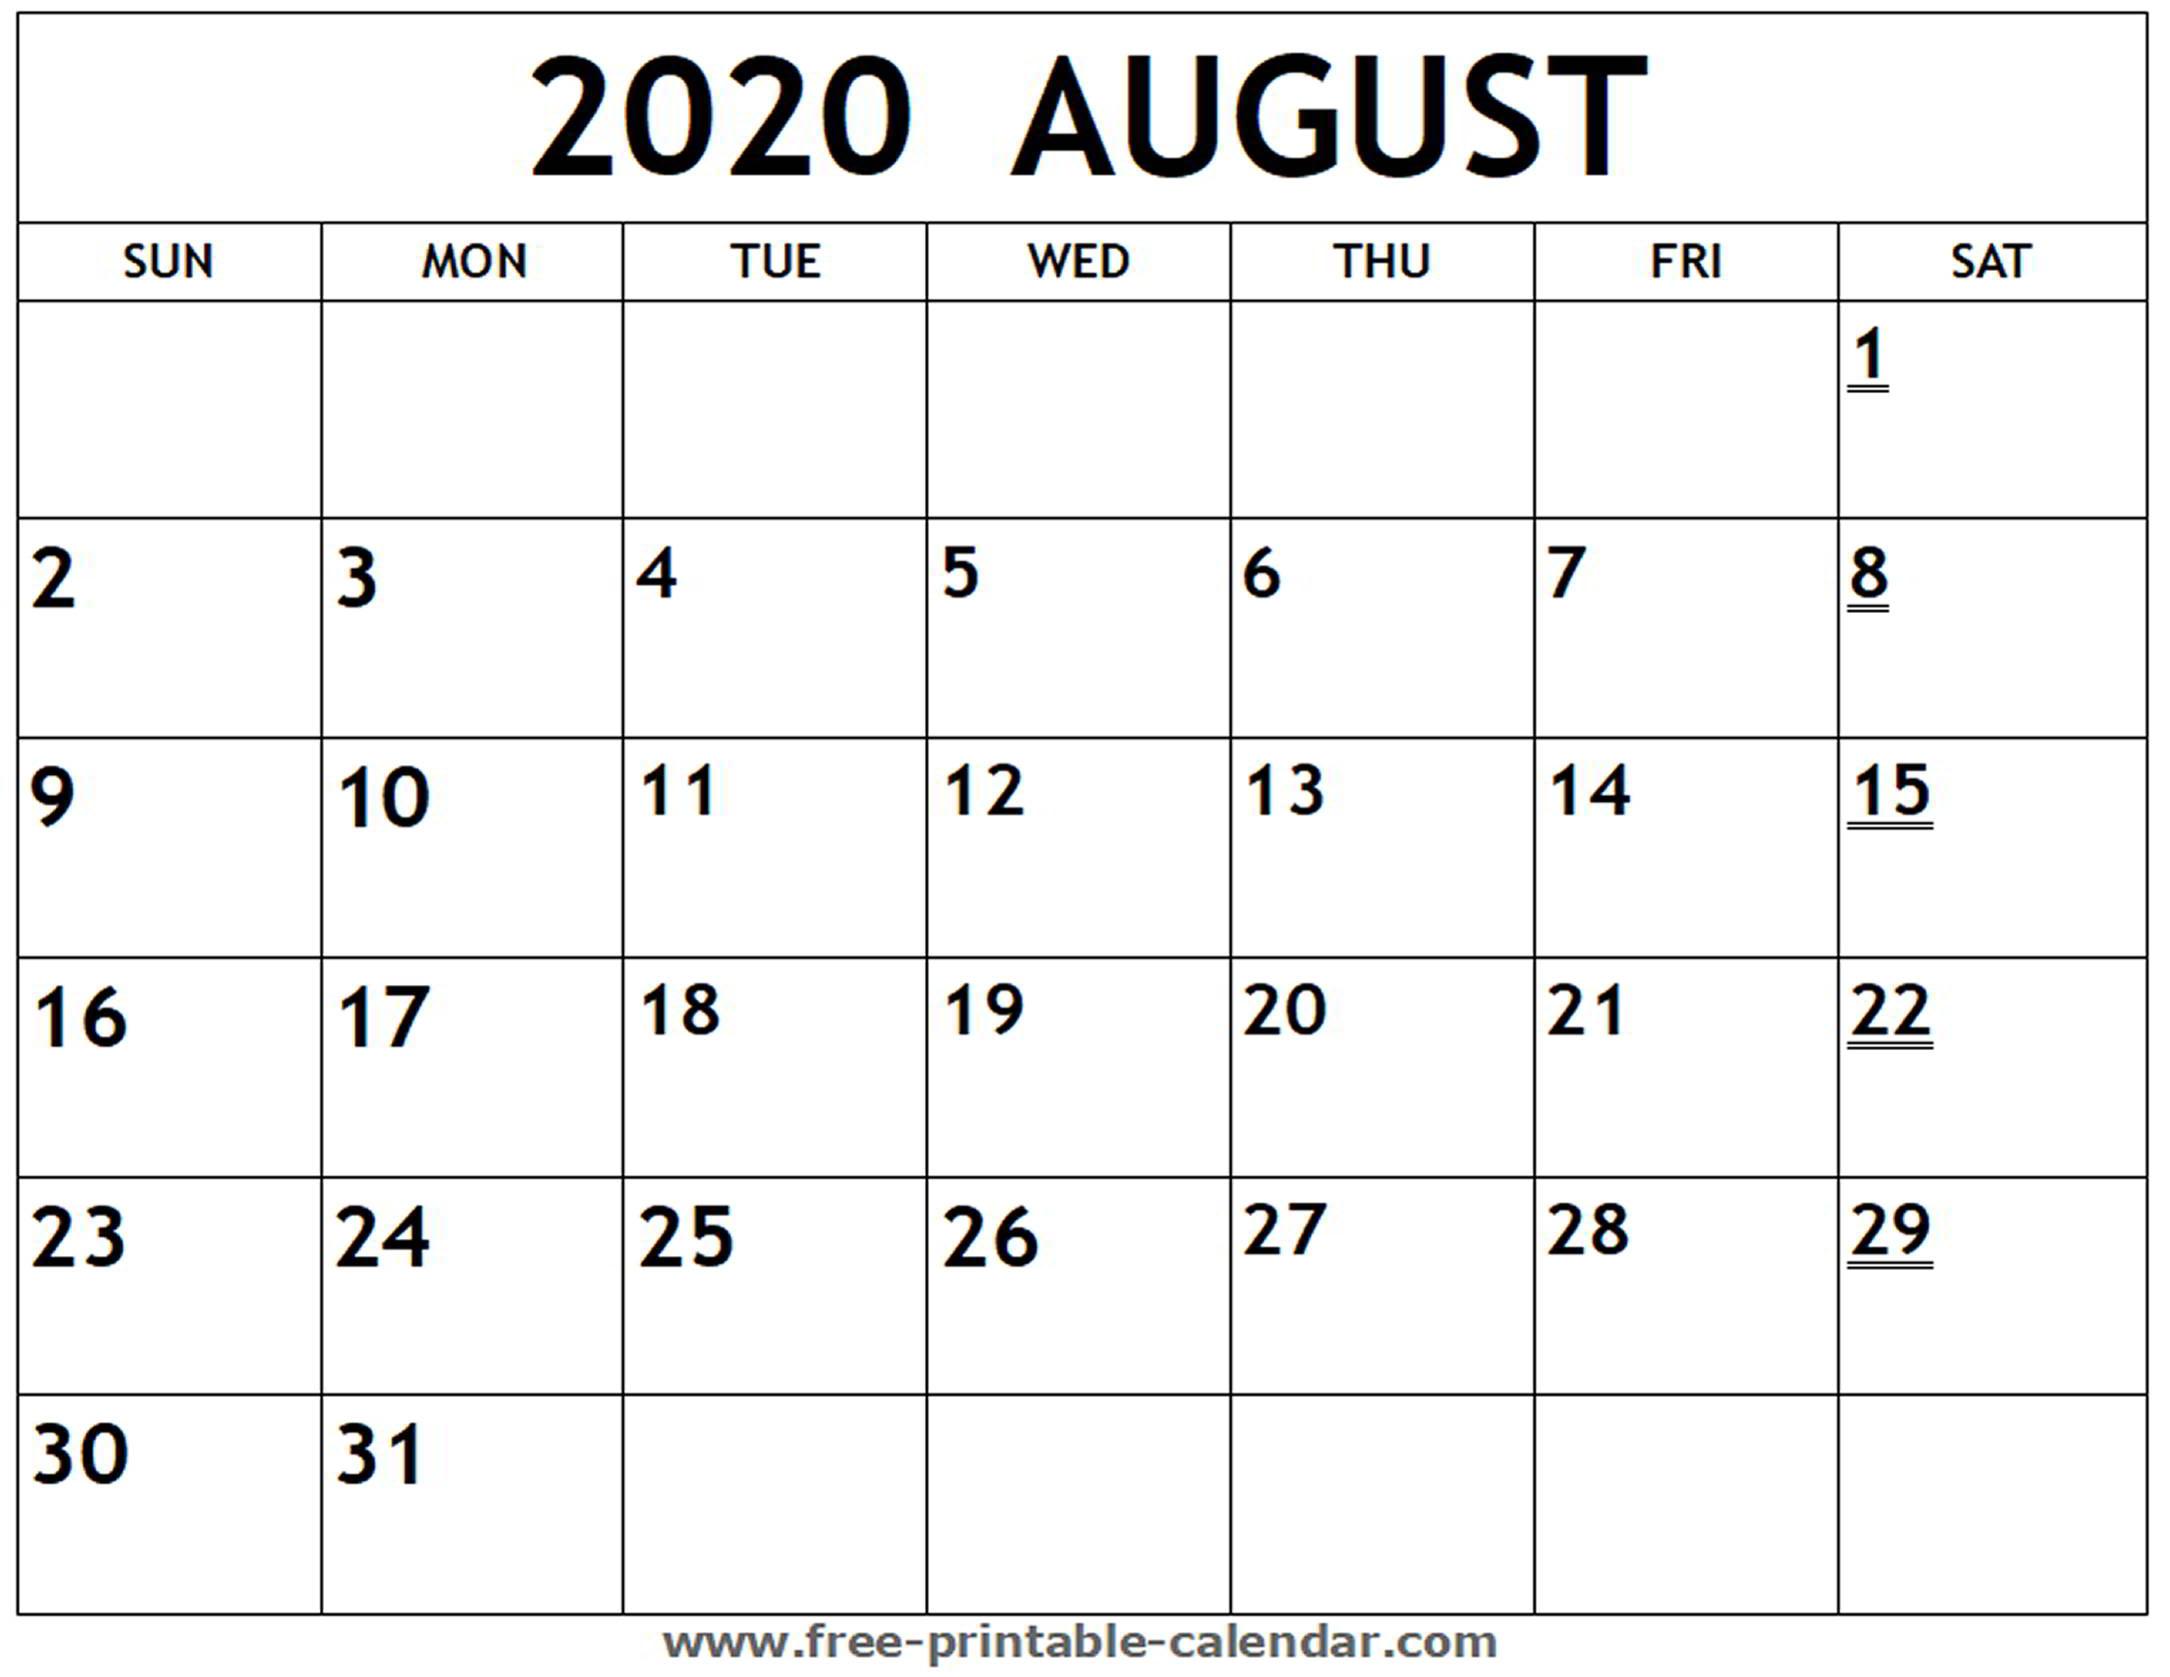 Printable 2020 August Calendar - Free-Printable-Calendar with regard to Free Fill In Calendars 2020